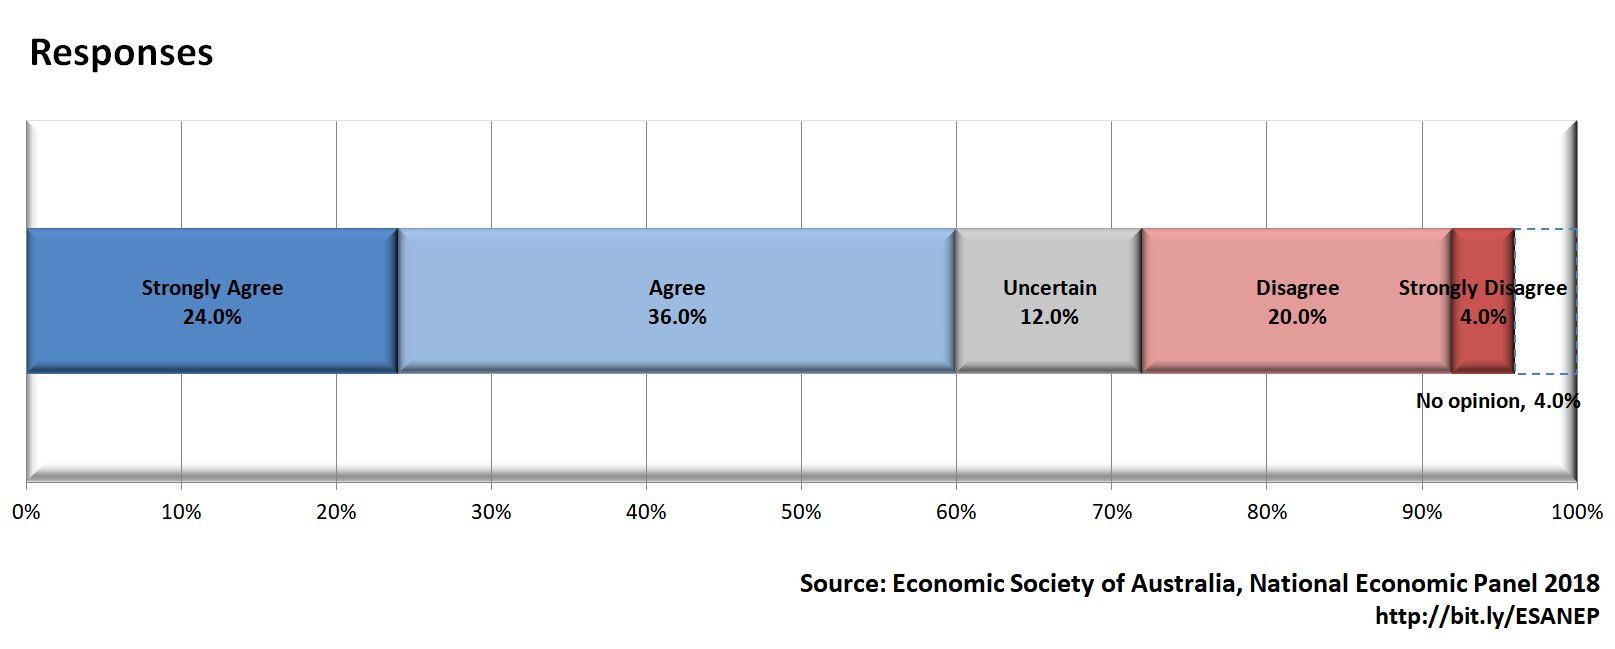 NEP Q30 - Chart 1 (Responses)